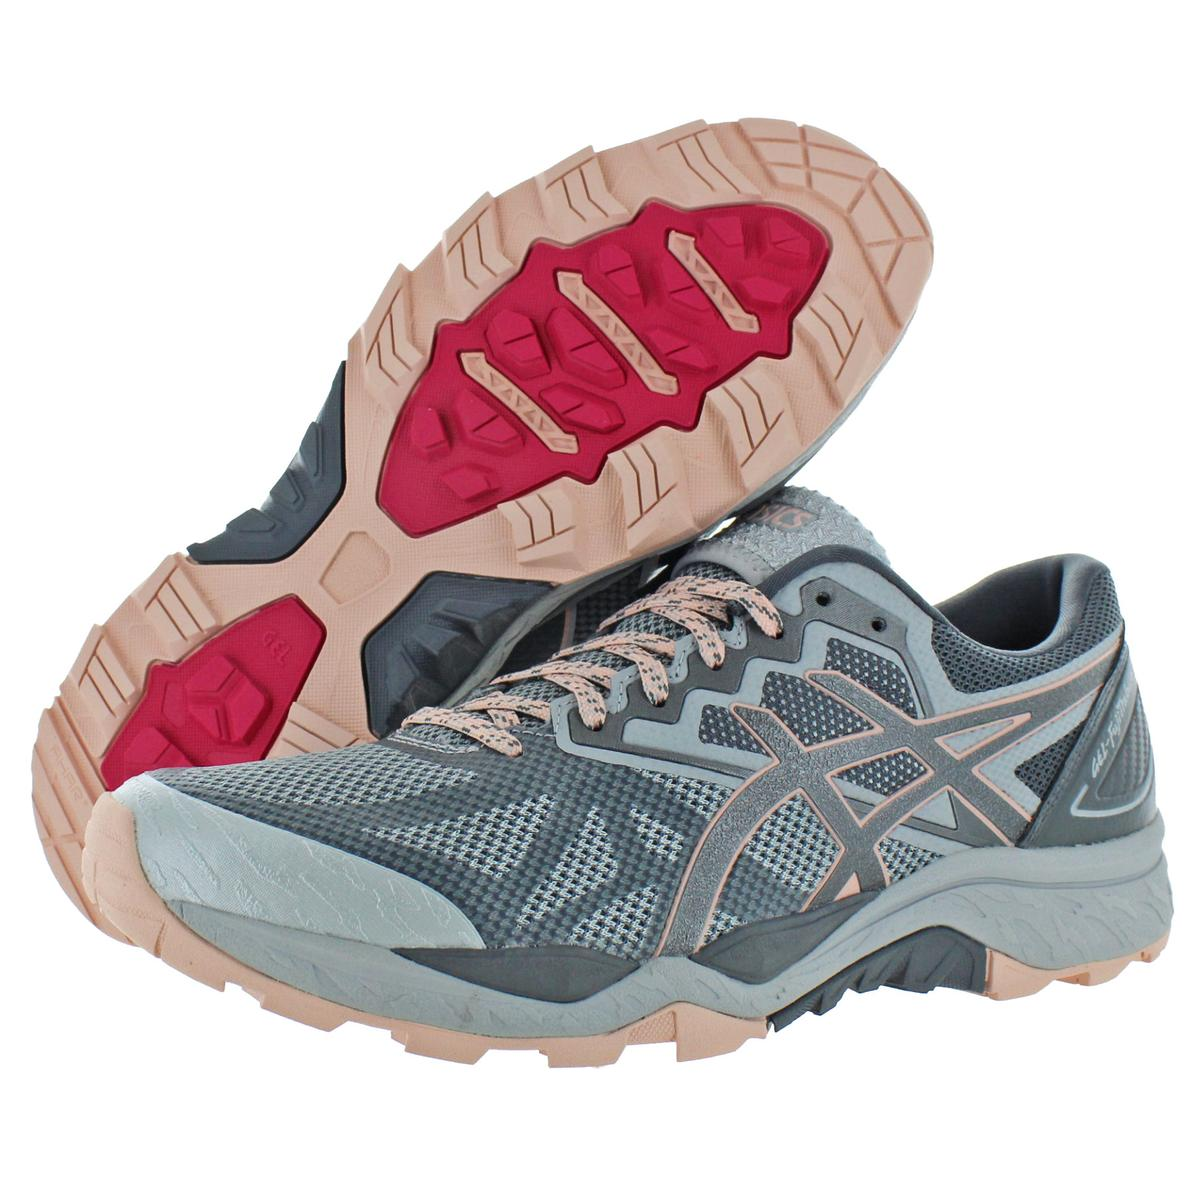 Asics-Womens-Gel-Fuji-Trabuco-6-Athletic-Running-Shoes-Sneakers-BHFO-7368 thumbnail 9